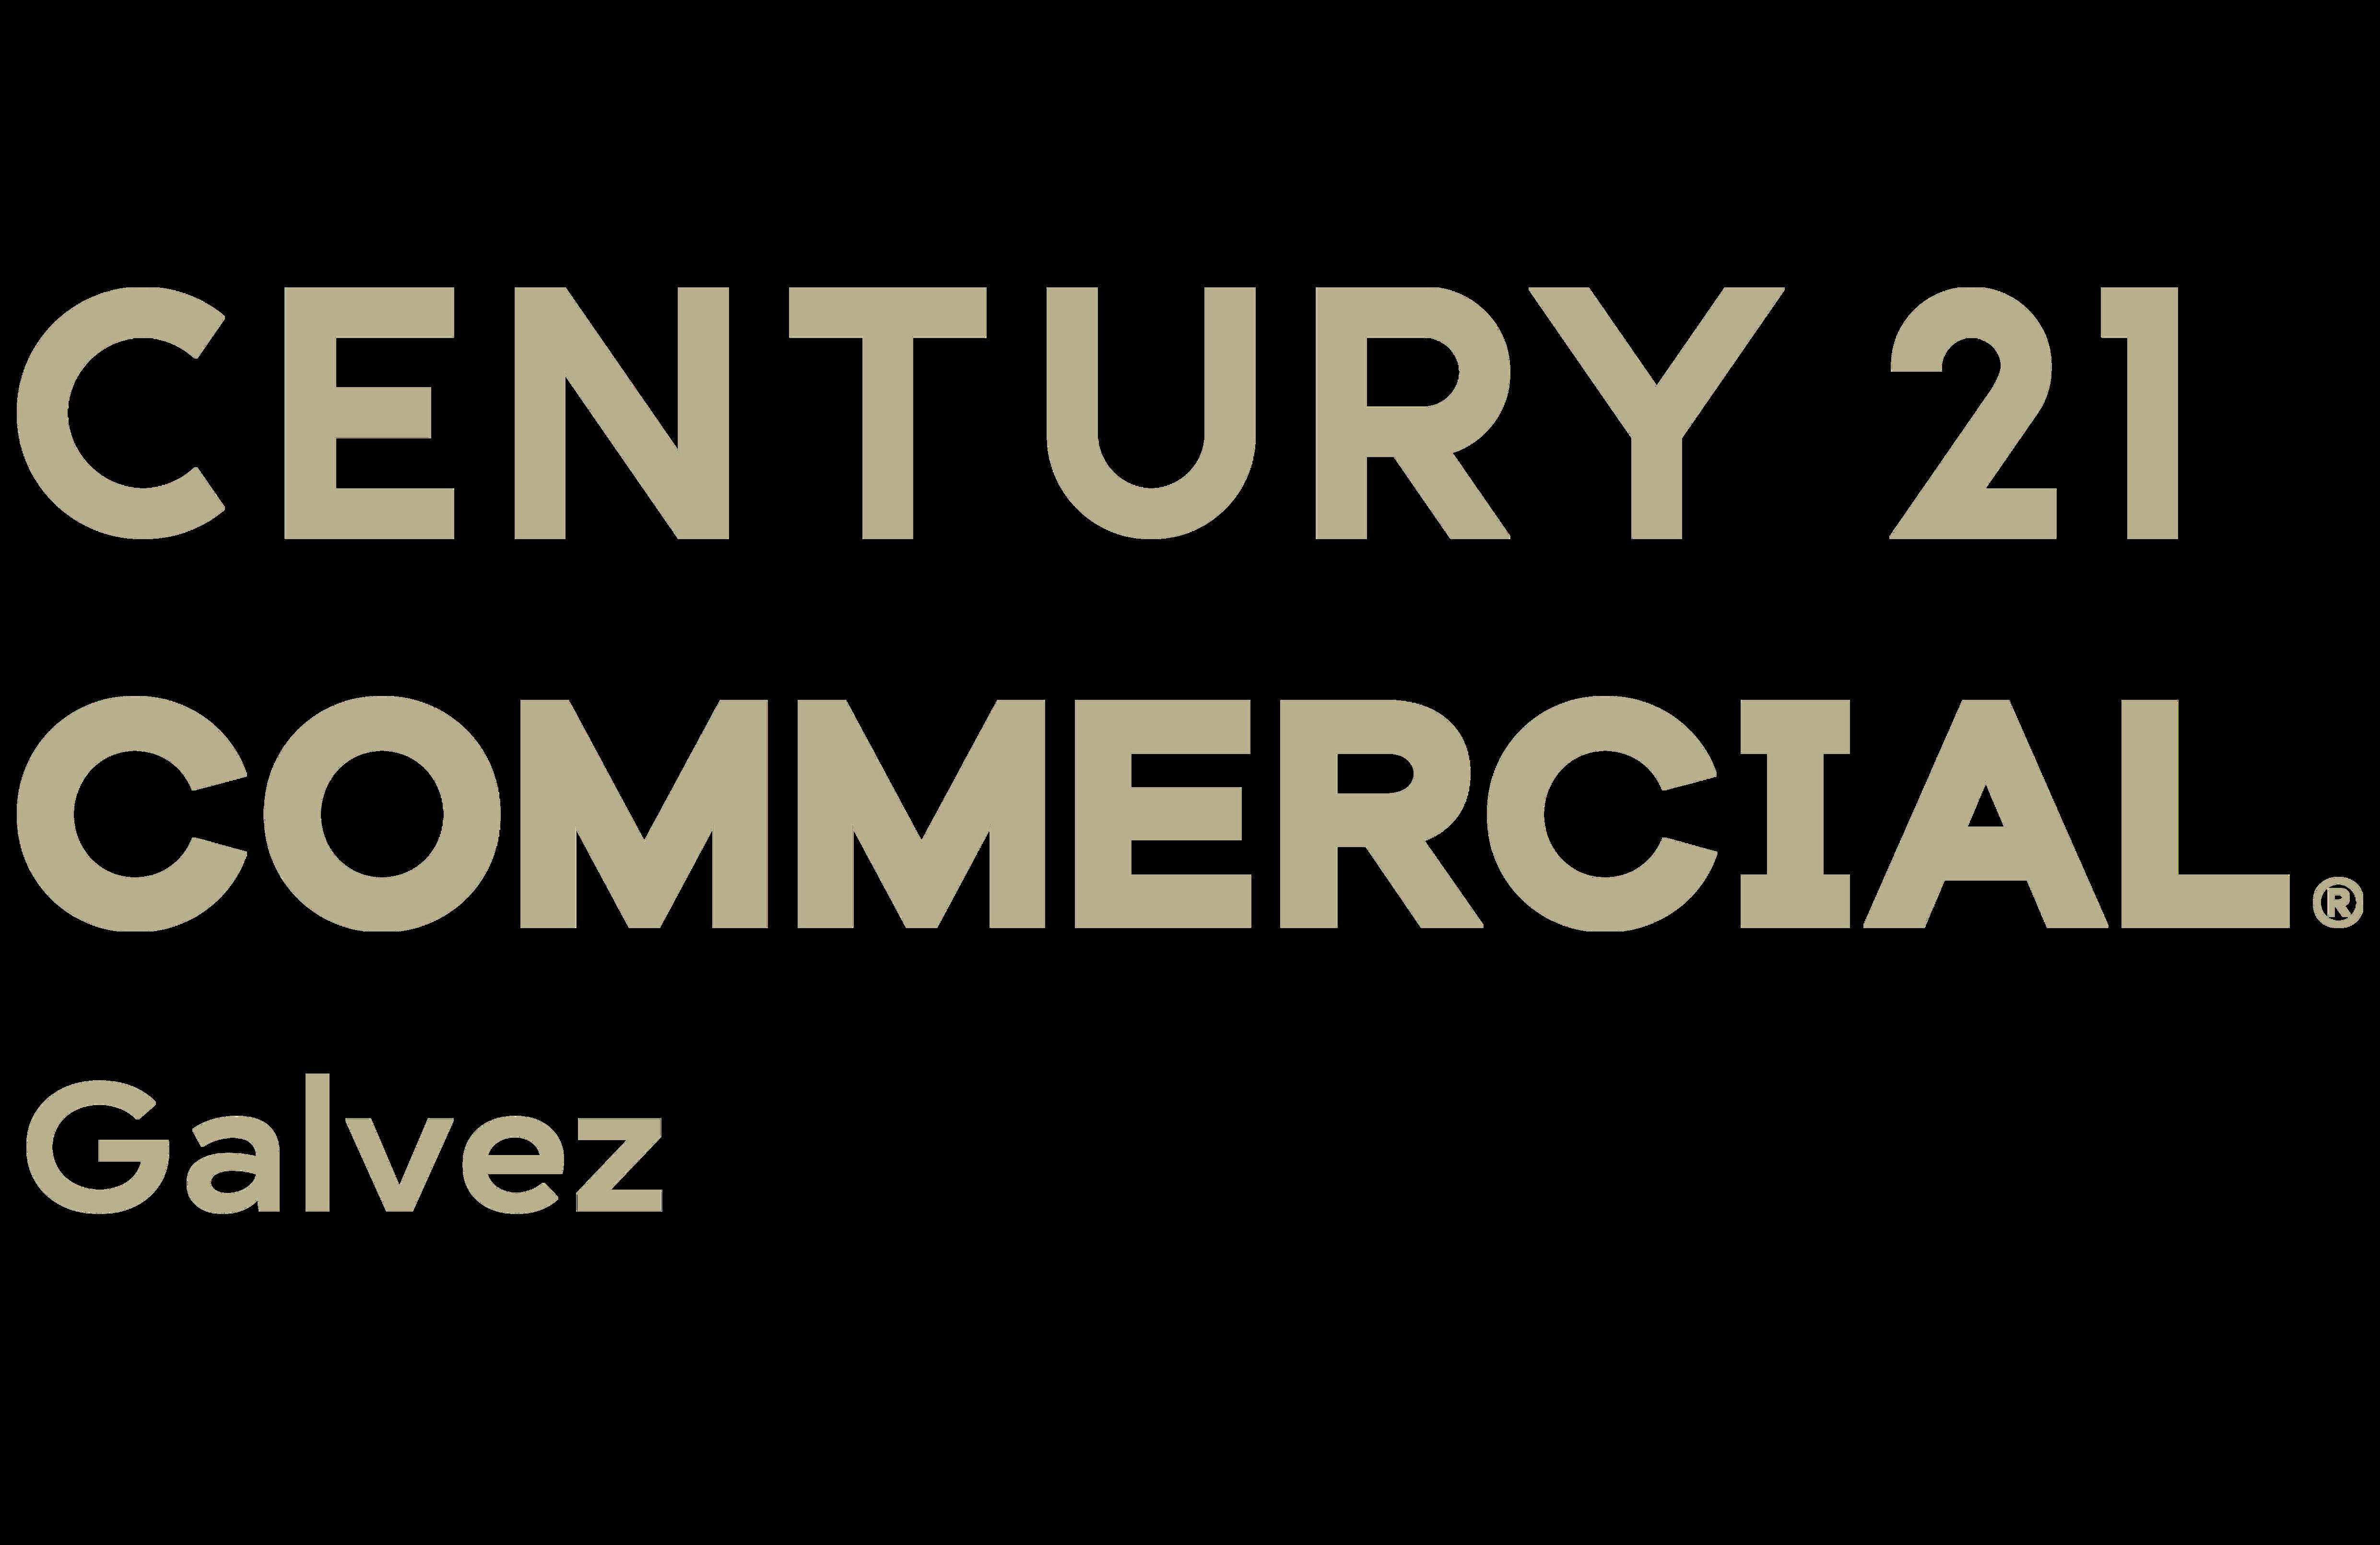 Alexander Galvez of CENTURY 21 Galvez logo